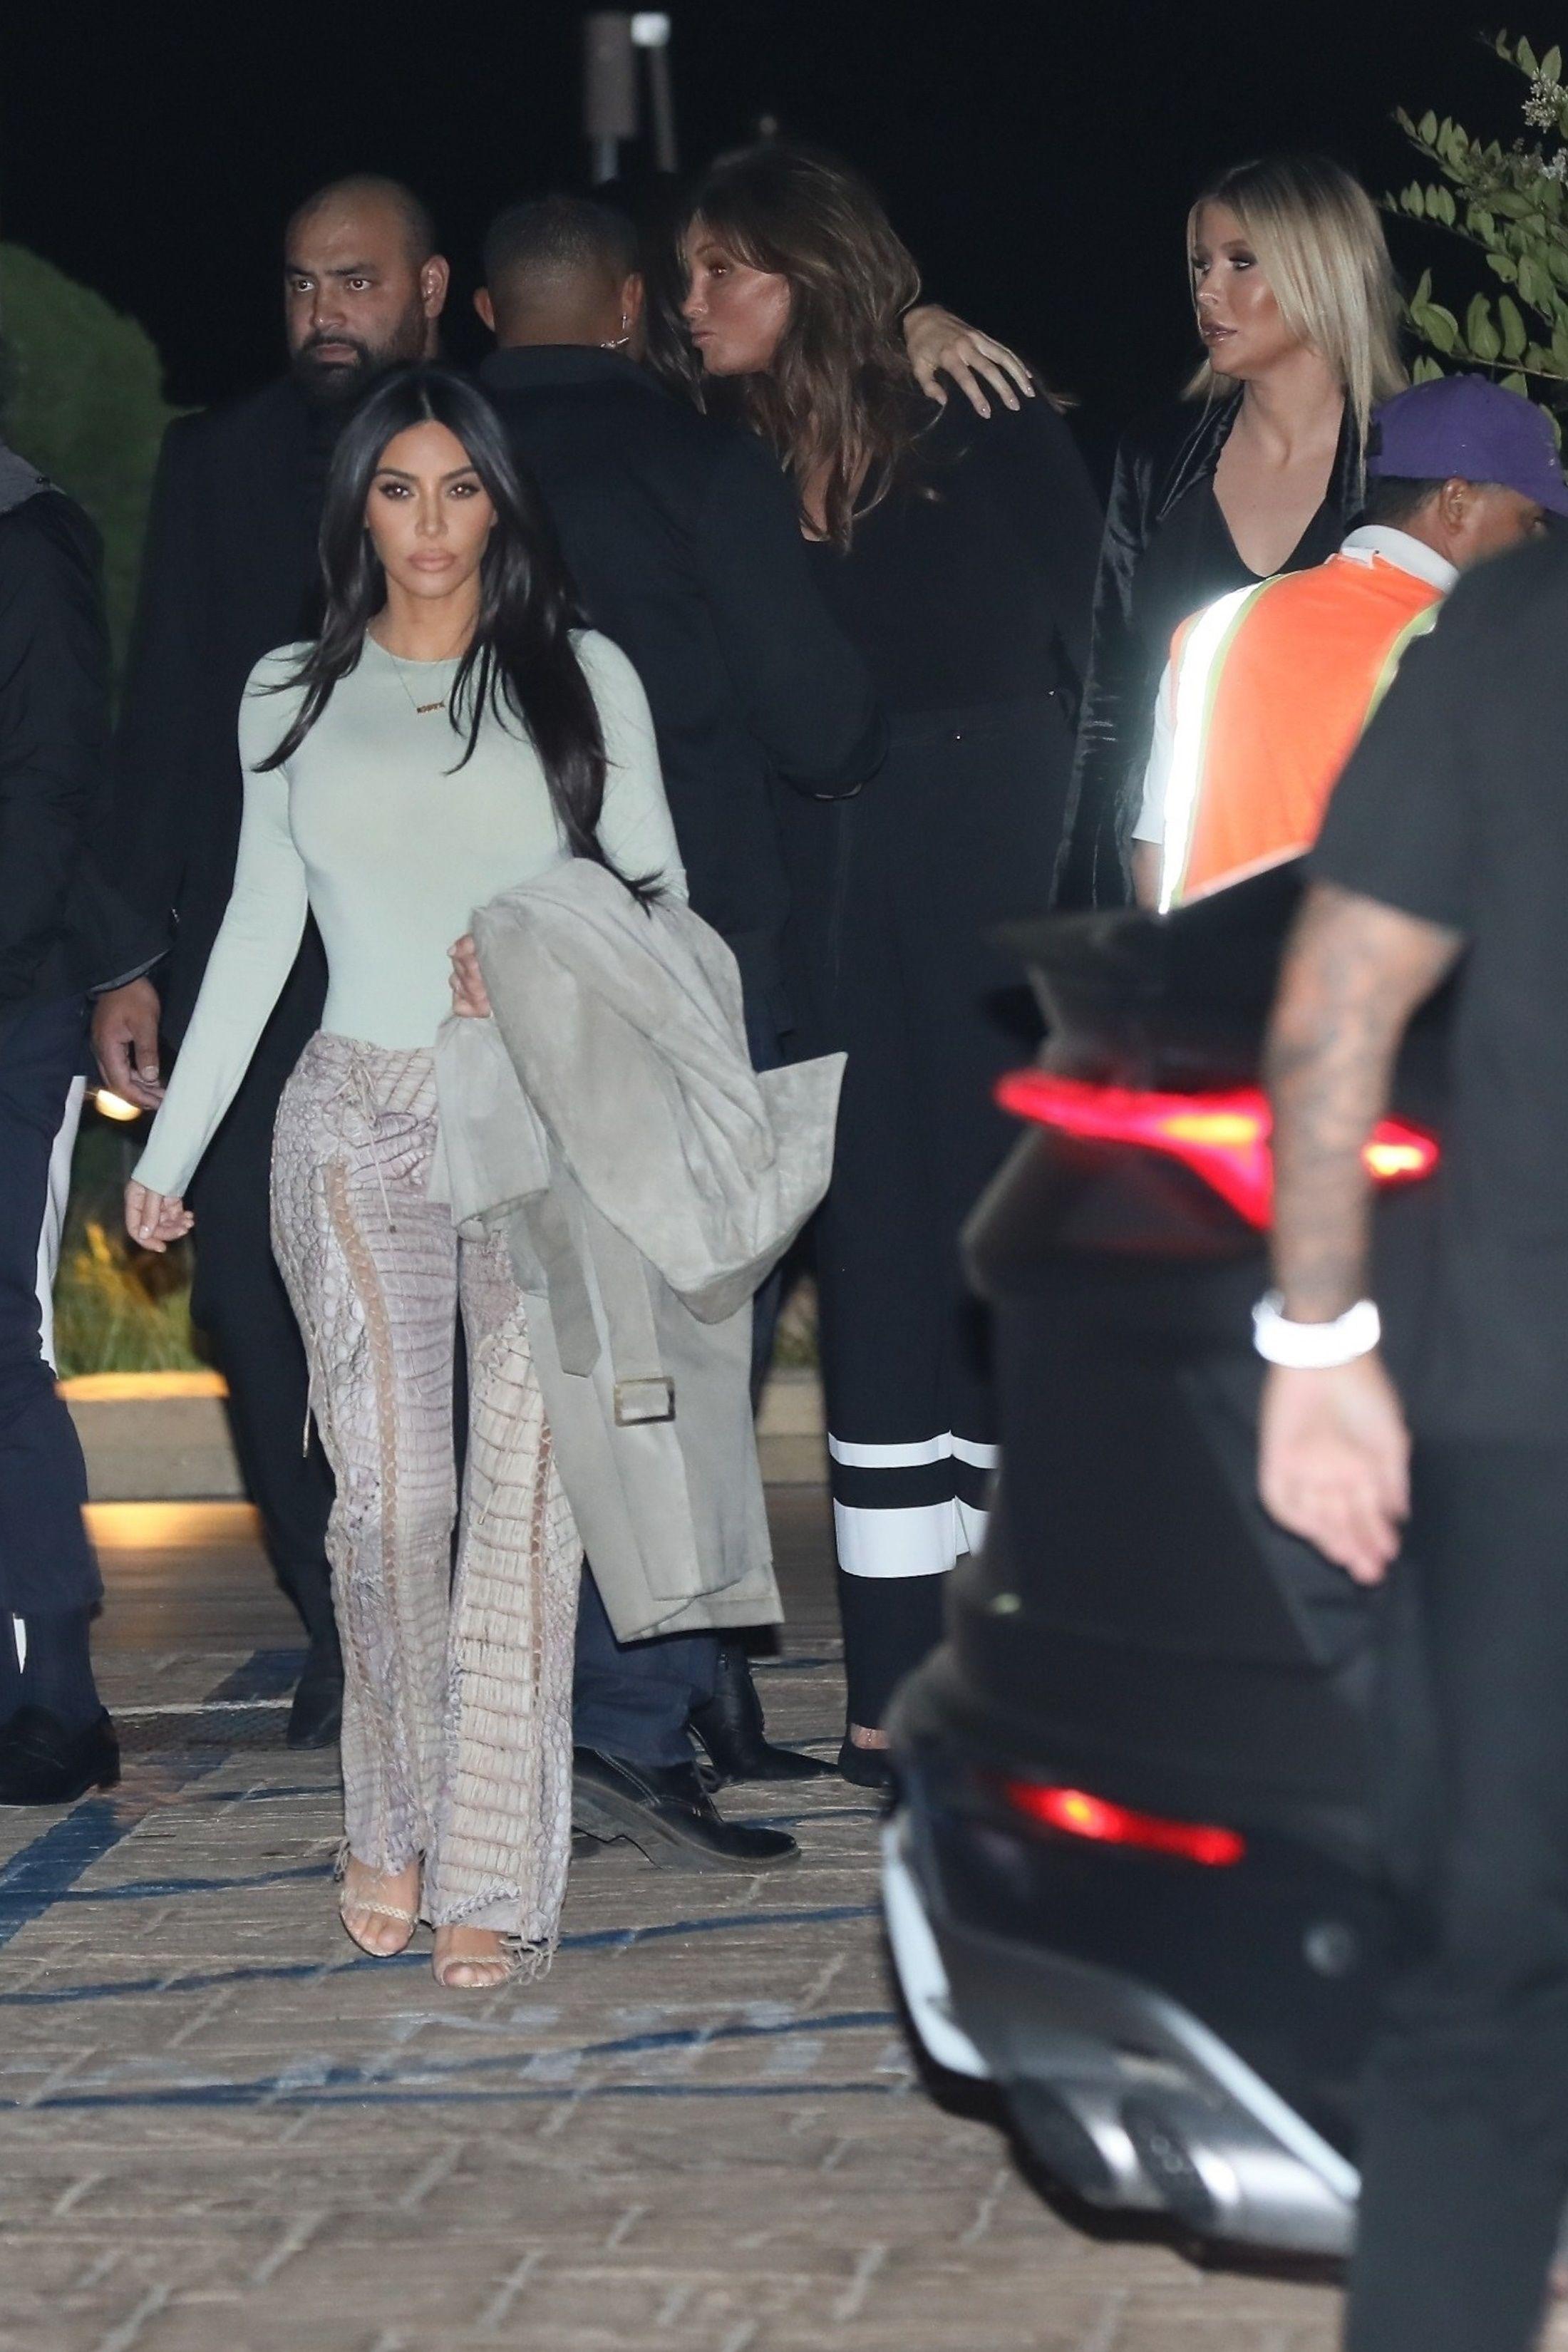 Kim Kardashian's Unedited Instagram Pics Compared to IRL Pap Shots